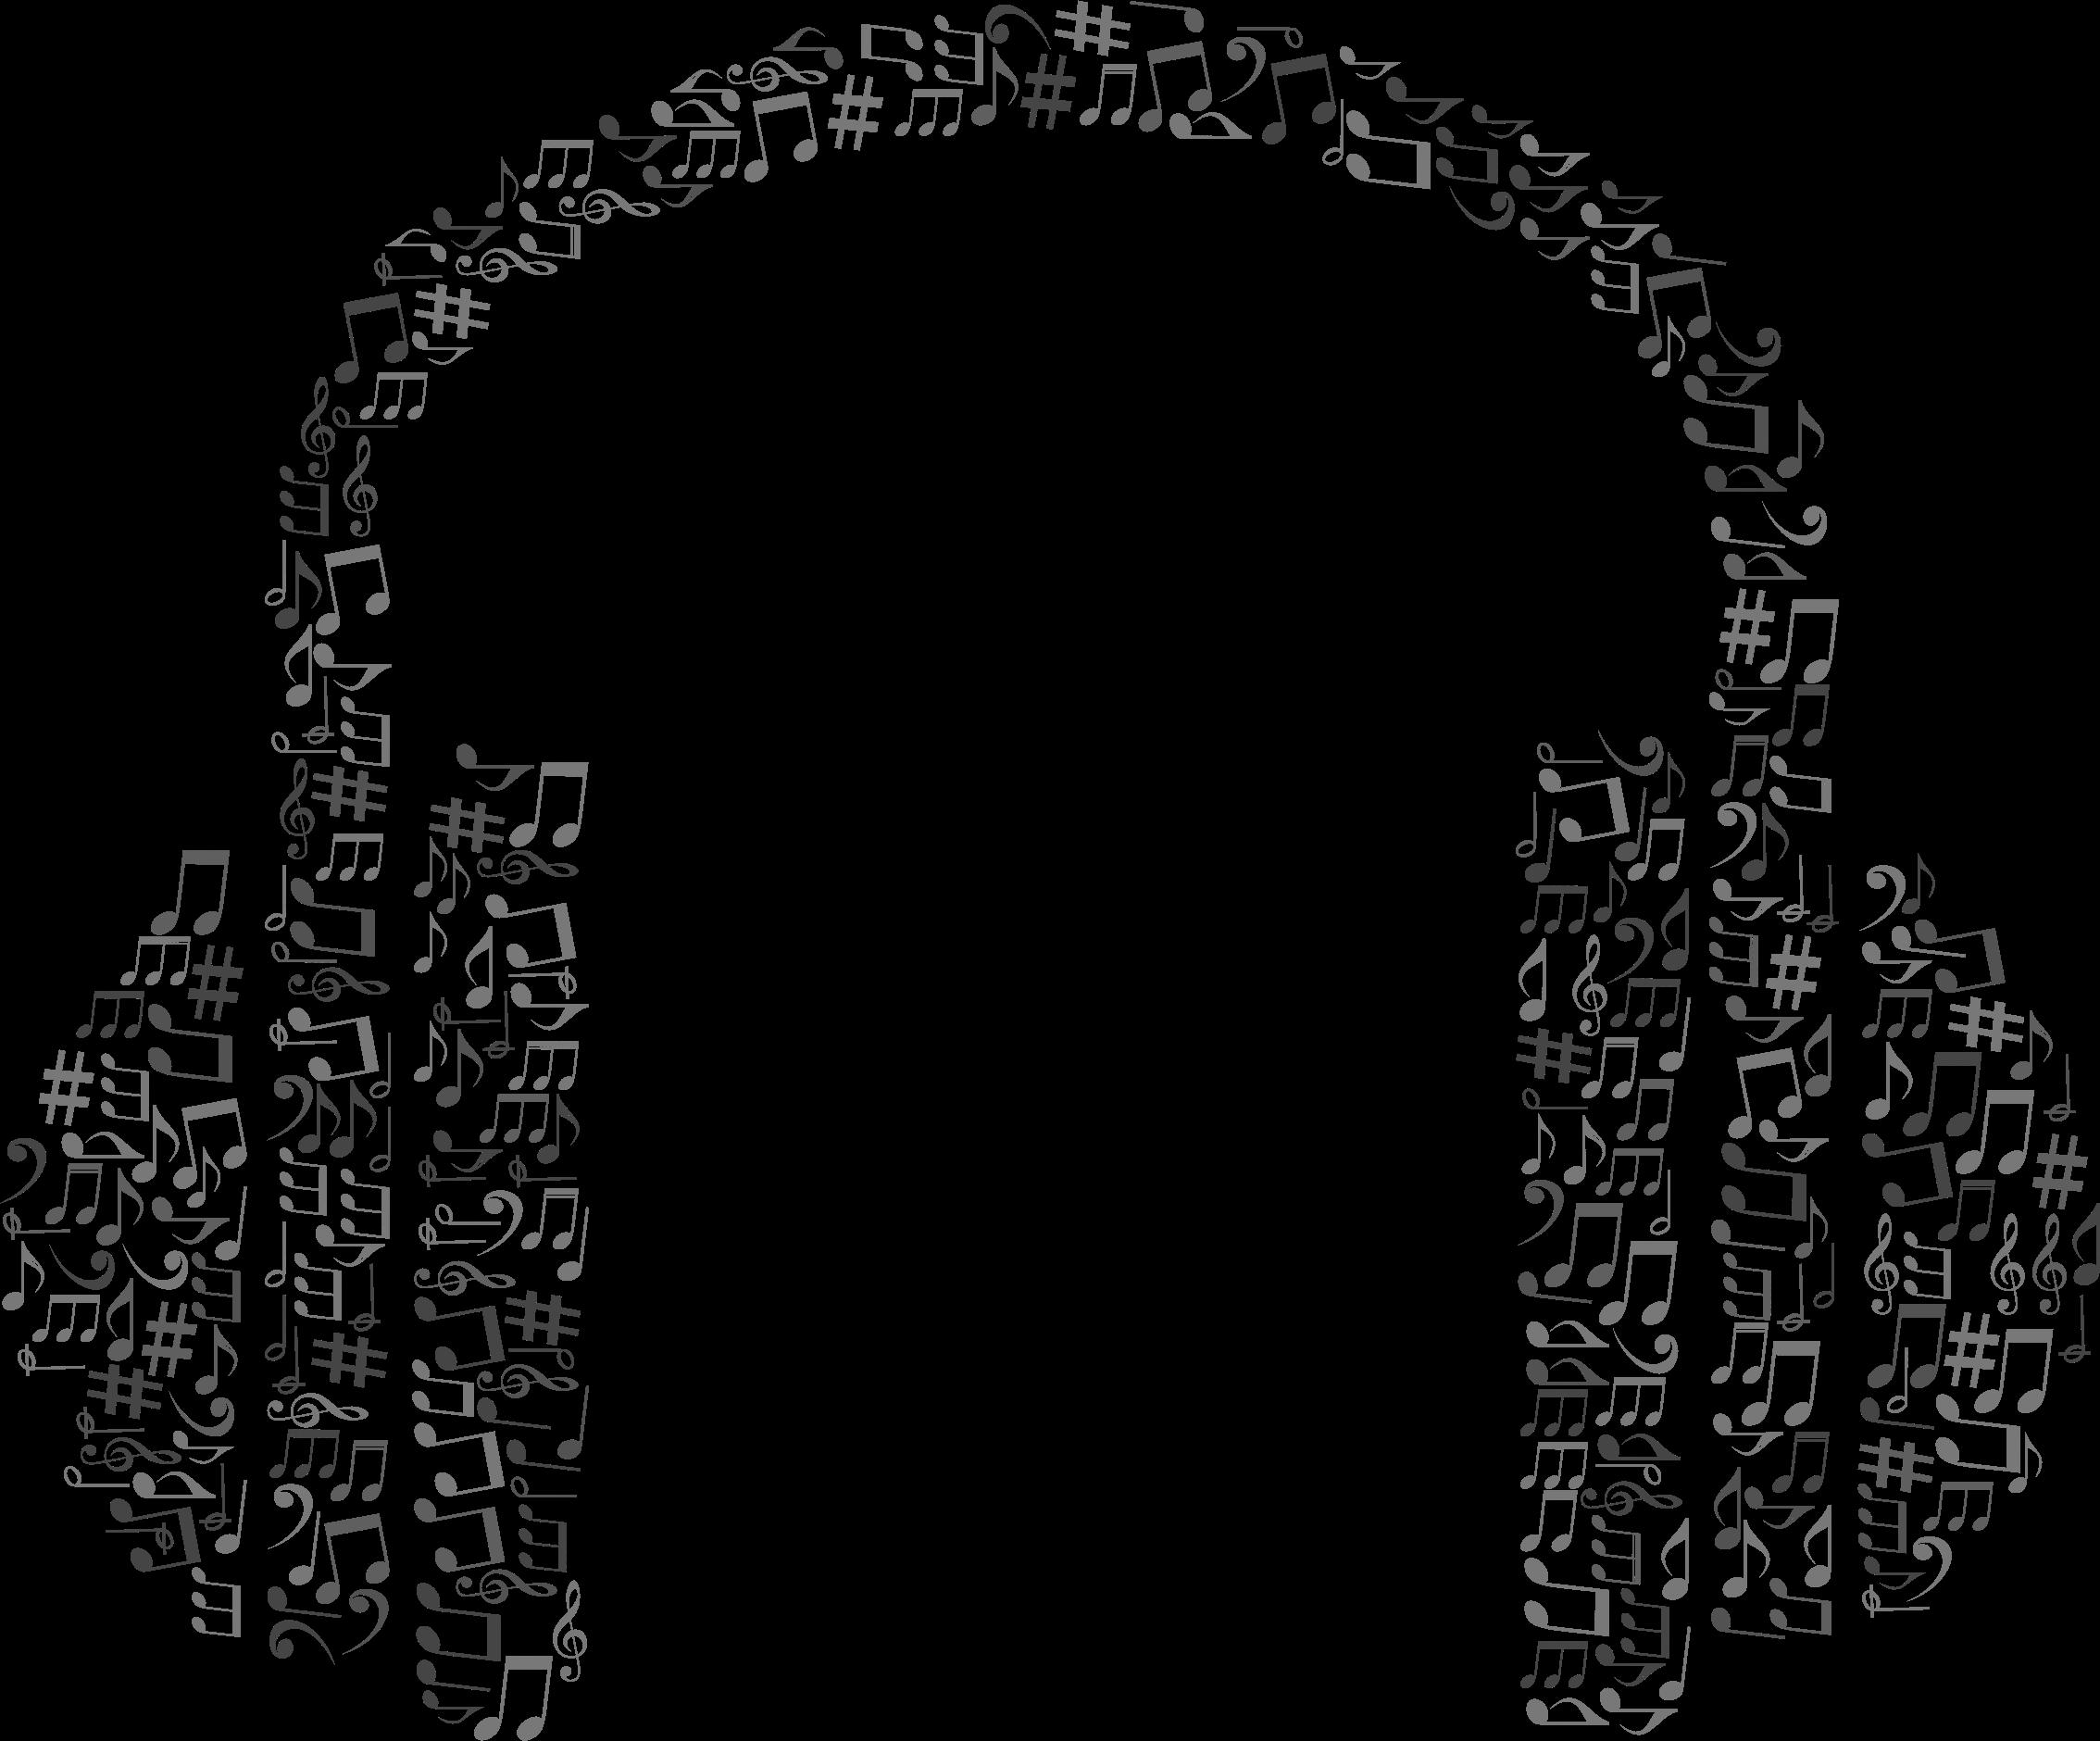 Headphone clipart big Headphone Grayscale (PNG) BIG IMAGE